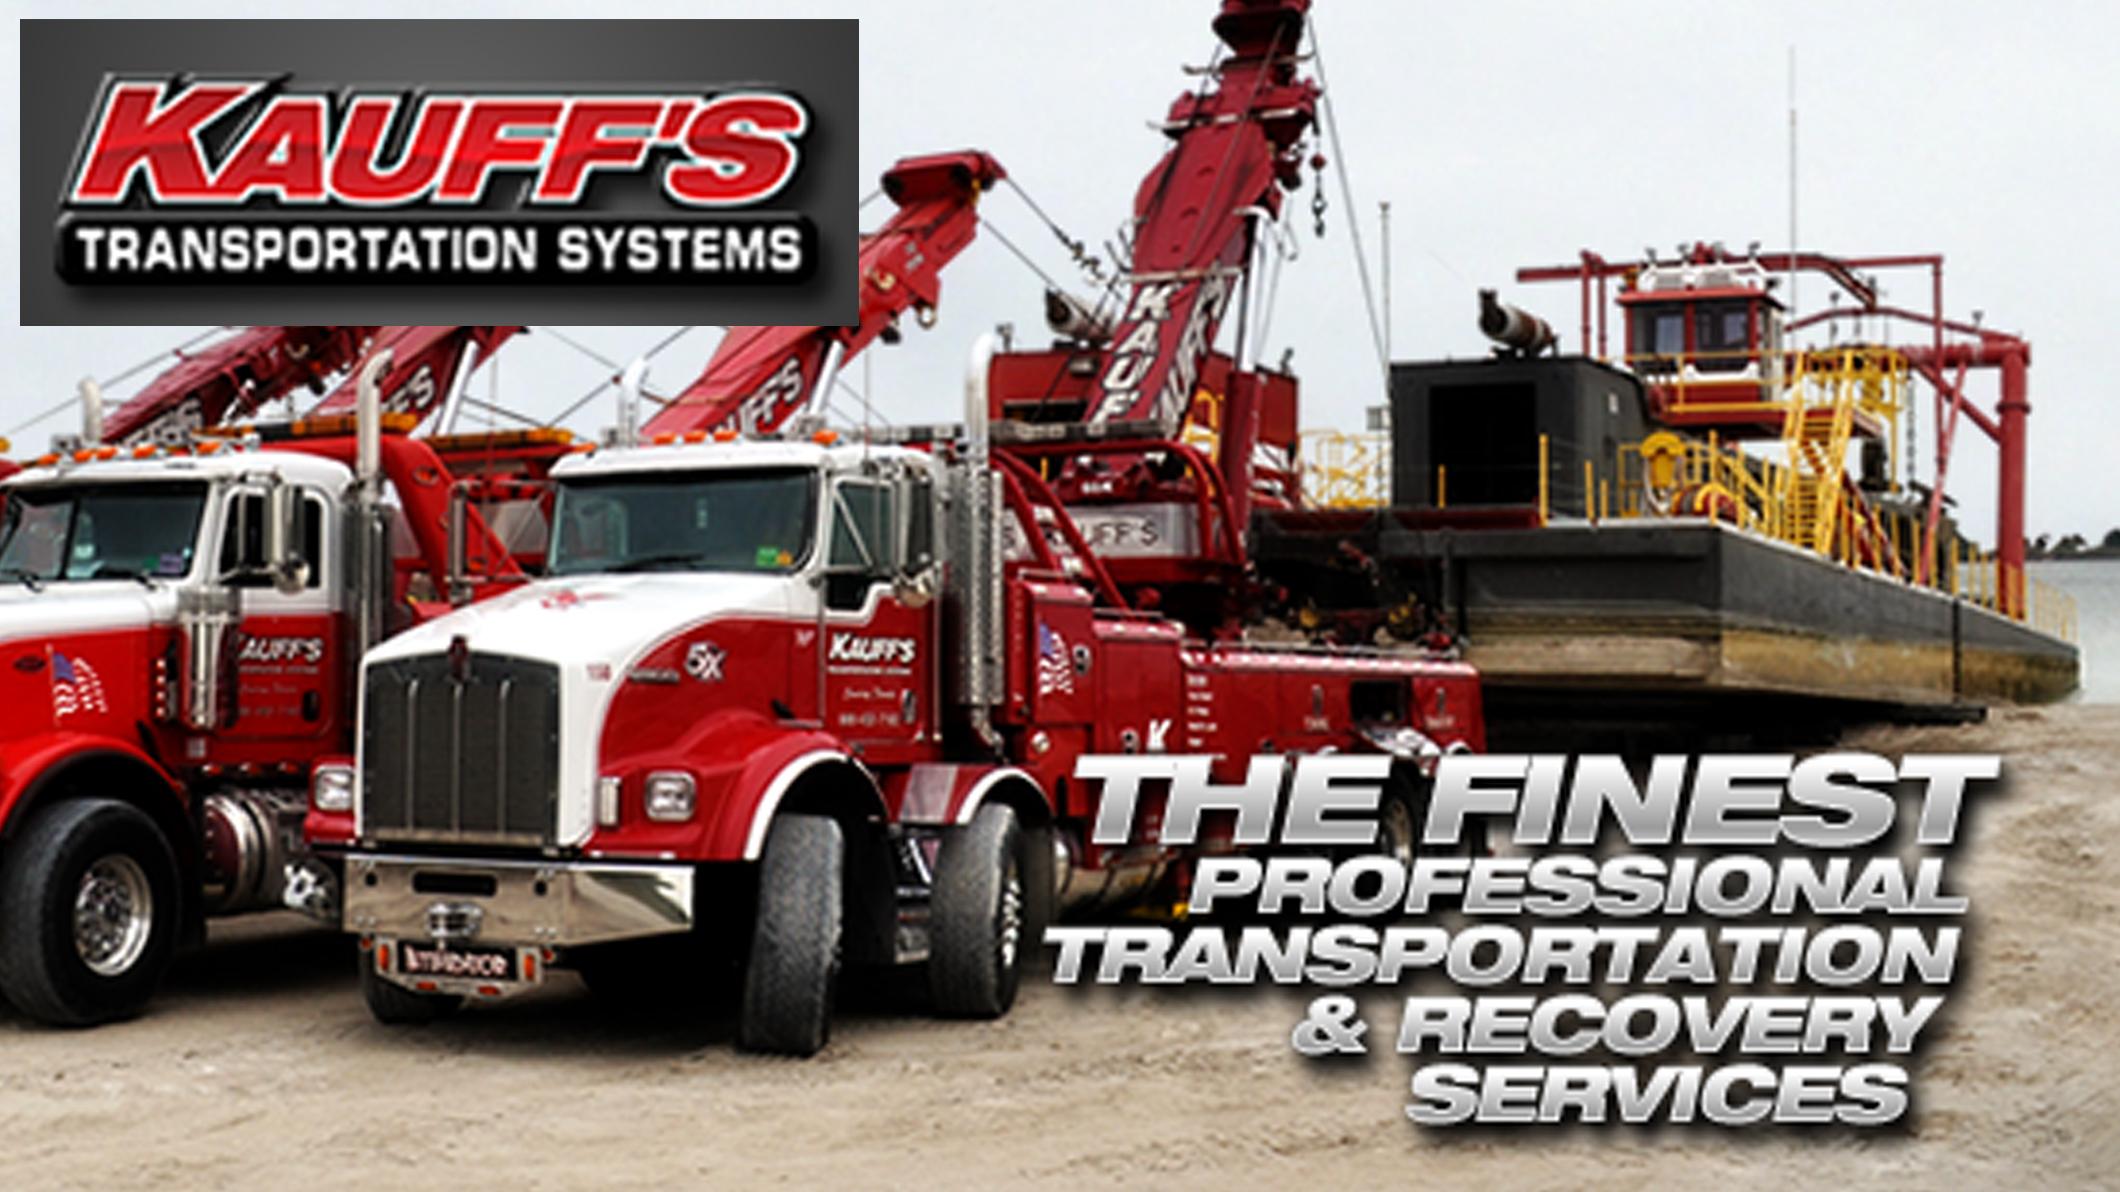 Kauff's Transportation Systems image 0